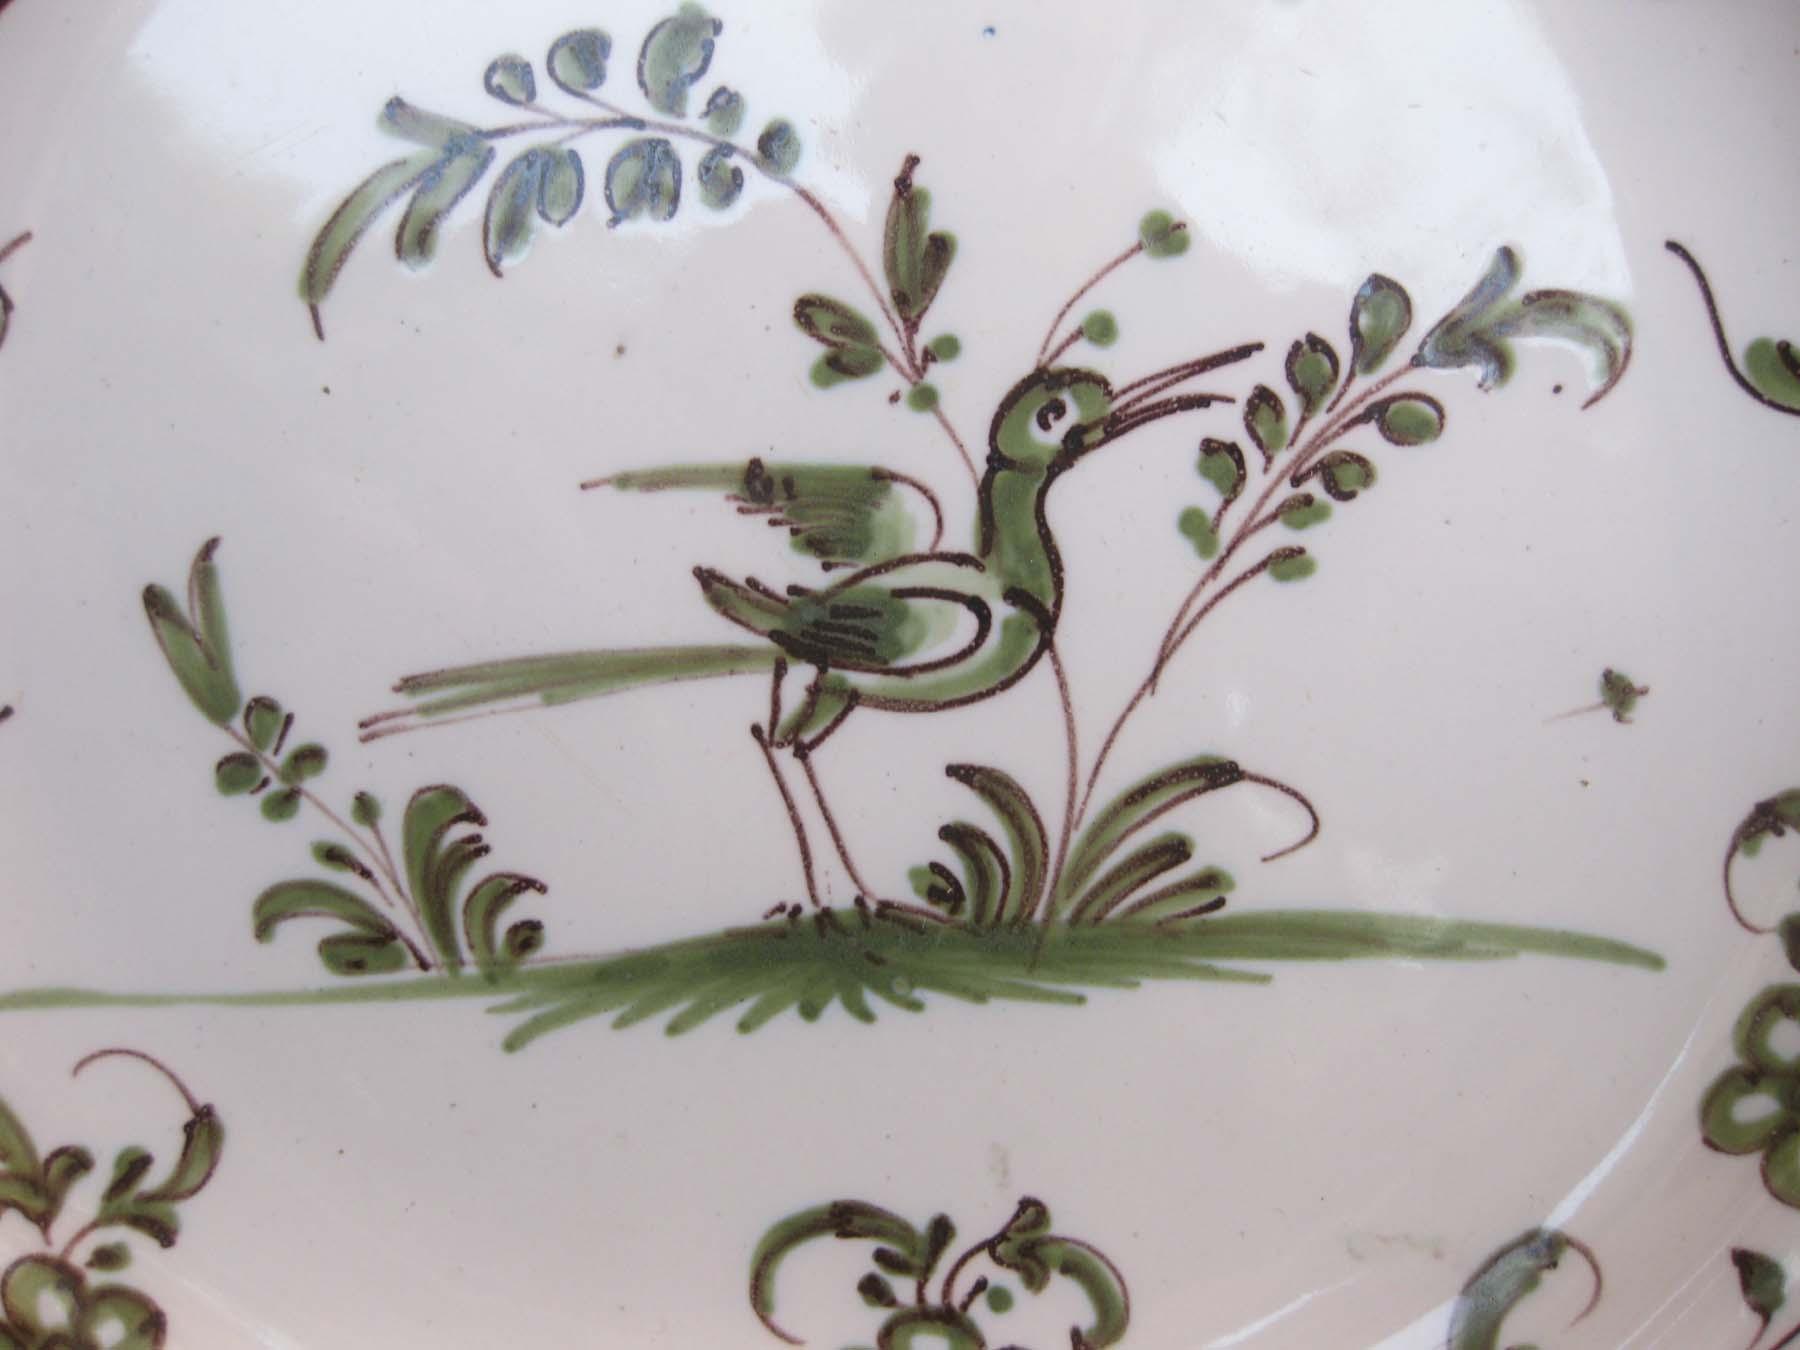 galeris-bosetti-antiquites,Moustiers camaIeu vert, oiseau